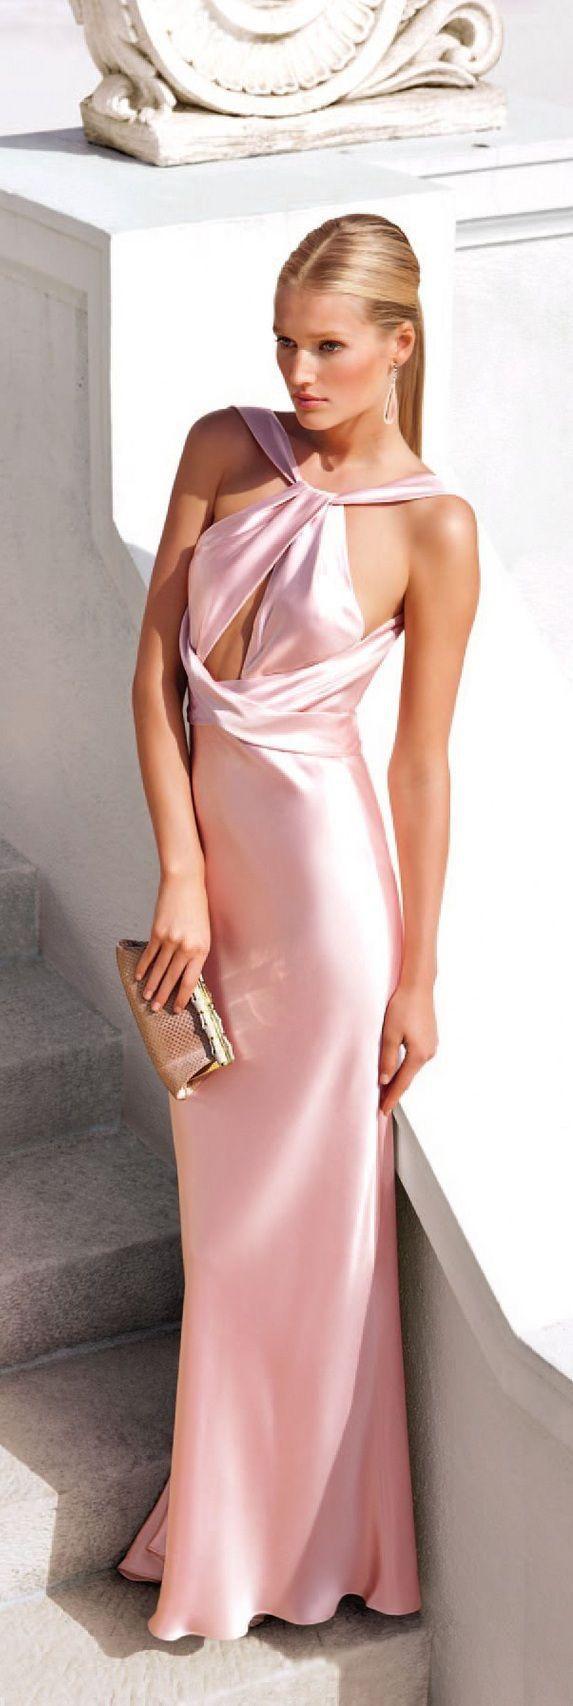 Ralph Lauren | dresis | Pinterest | Glamour y Vestiditos